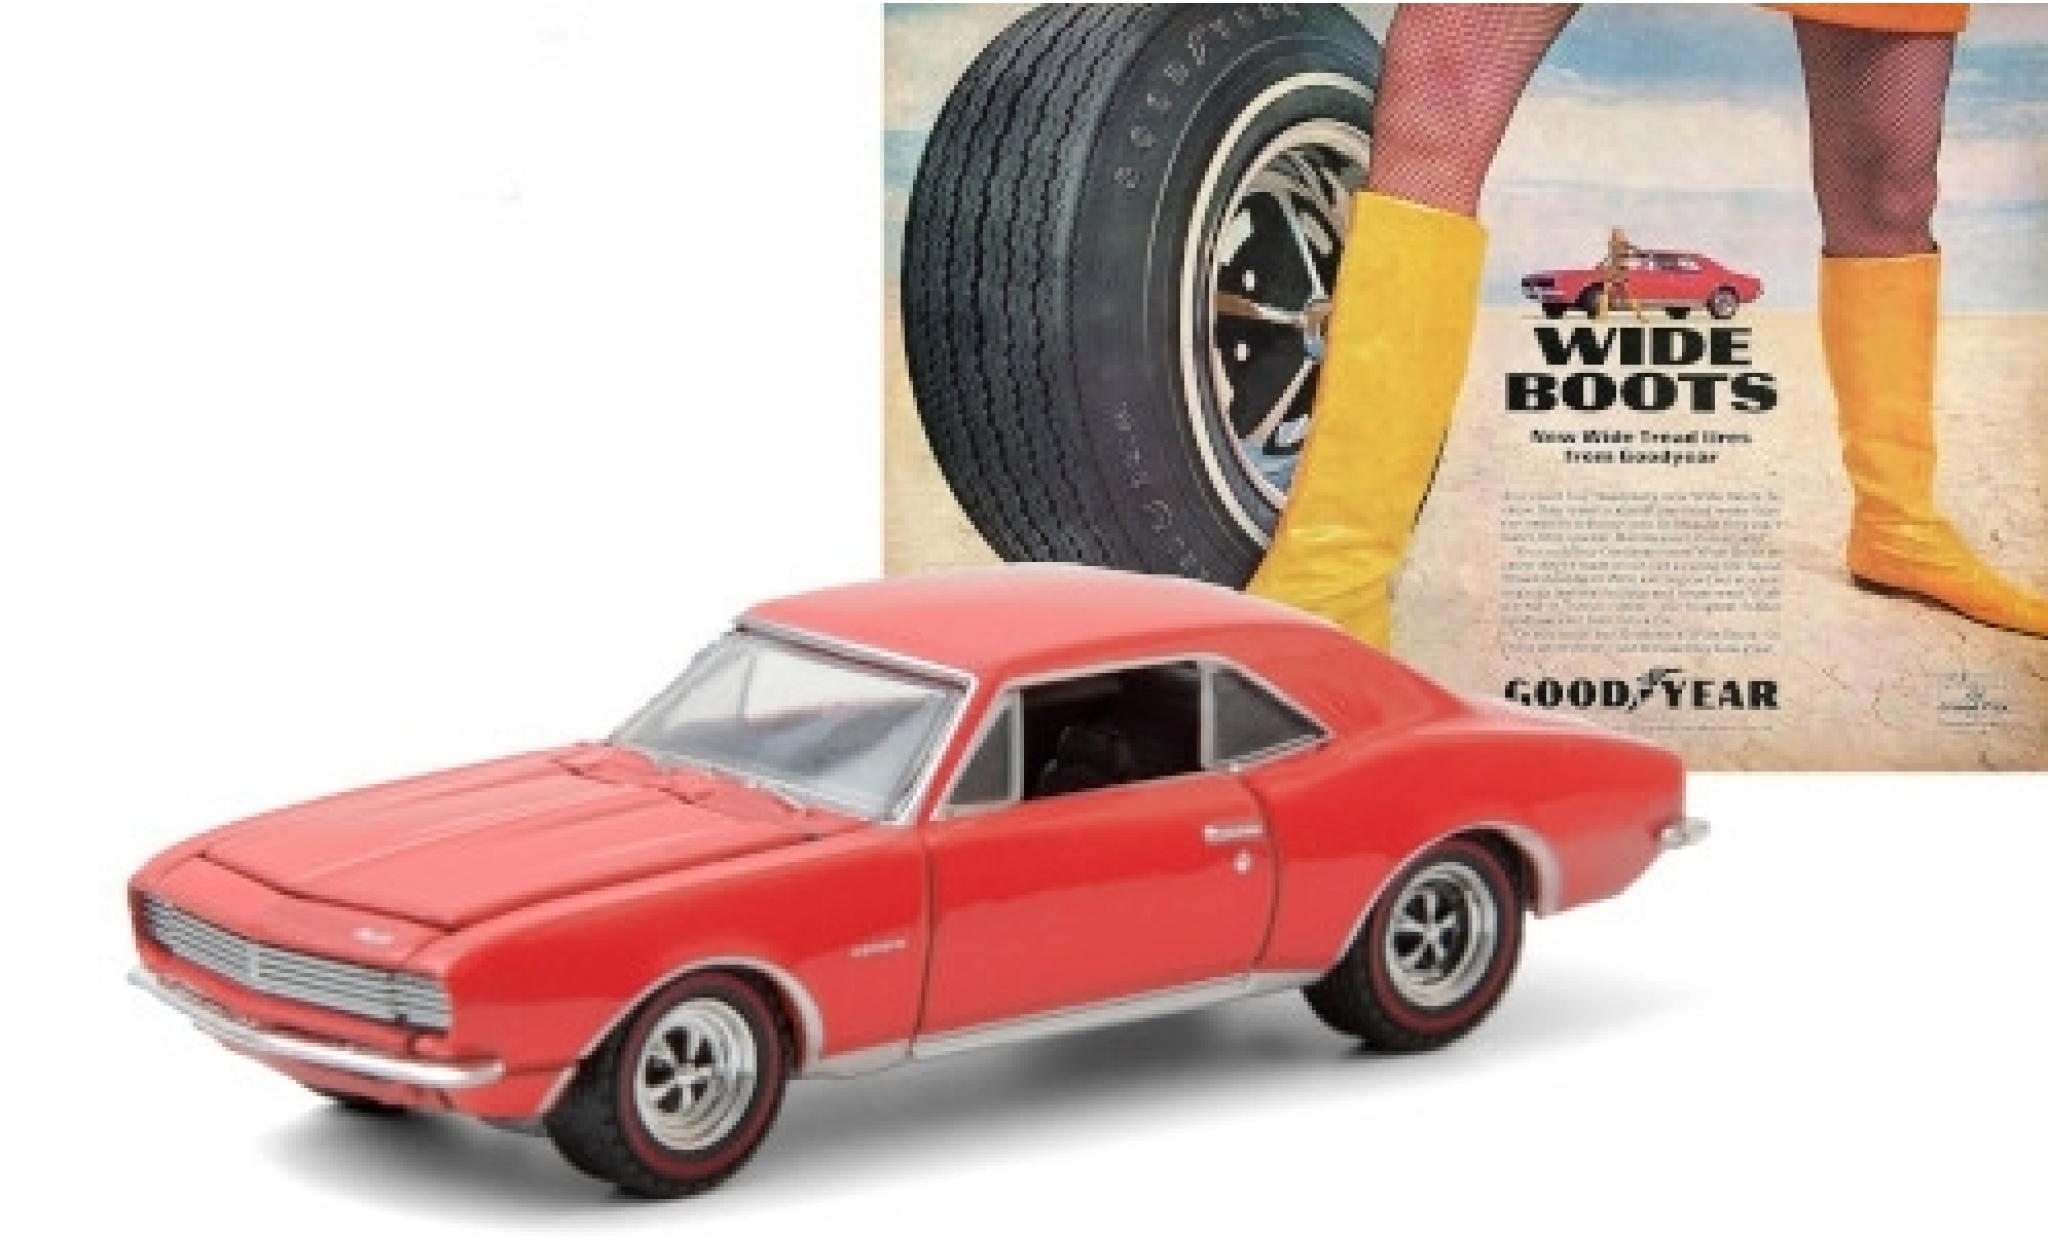 Chevrolet Camaro 1/64 Greenlight red 1967 Goodyear Wide Tread Tires